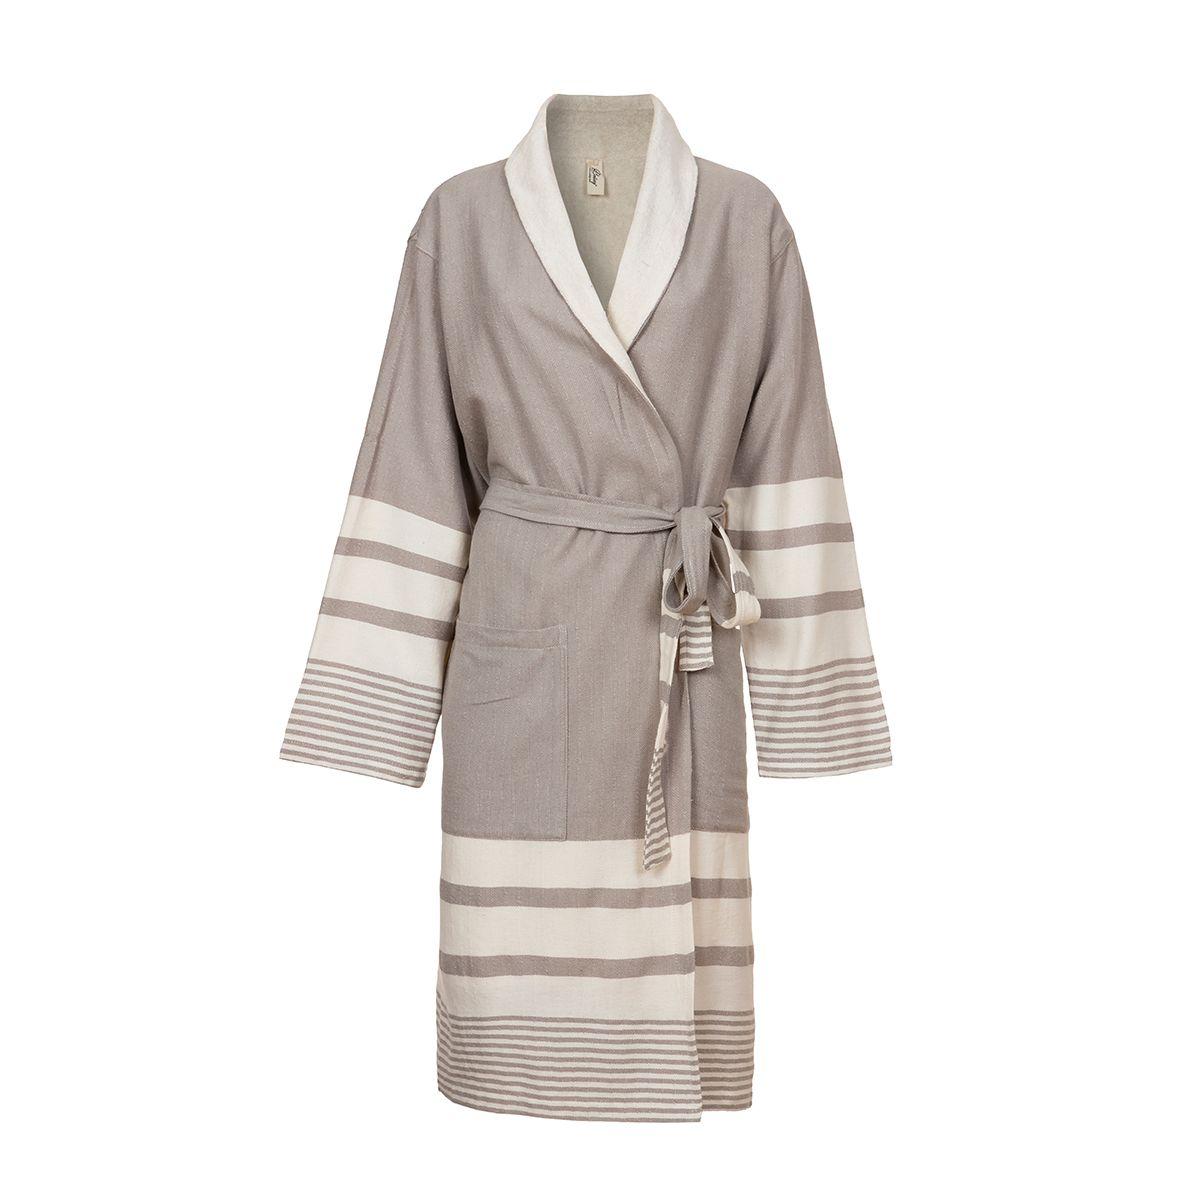 Bathrobe Tabiat with towel - Taupe